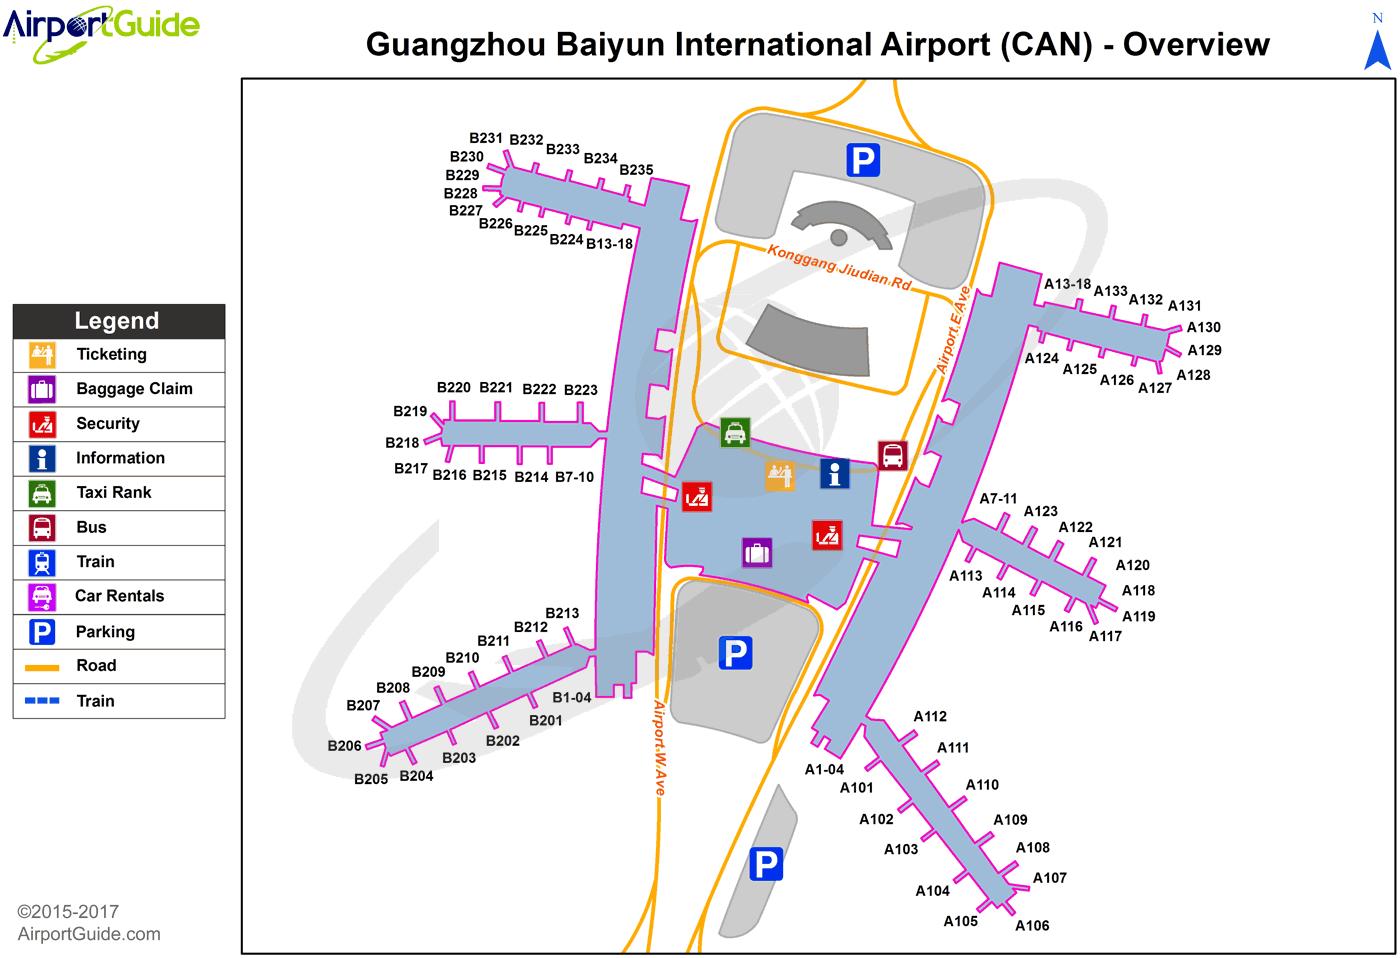 Guangzhou Canton Guangzhou Baiyun International Can Airport Terminal Map Overview Airport Map Airport Guide Outdoor Quotes